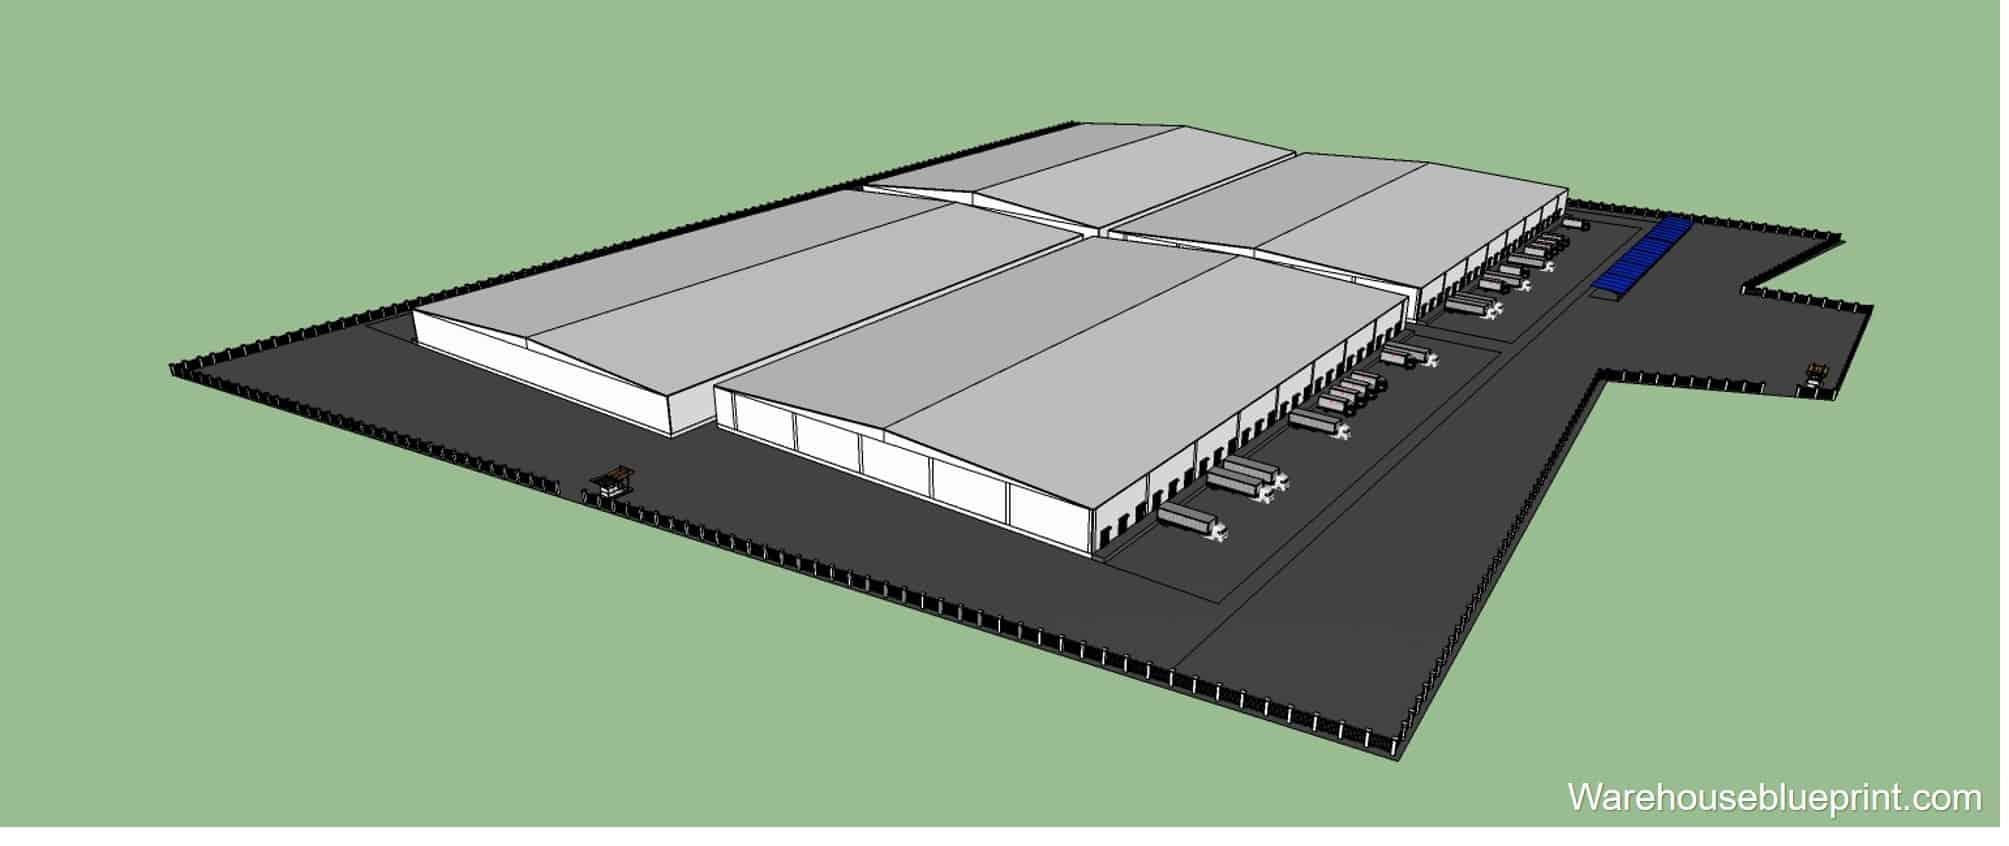 Warehouse Layout 4